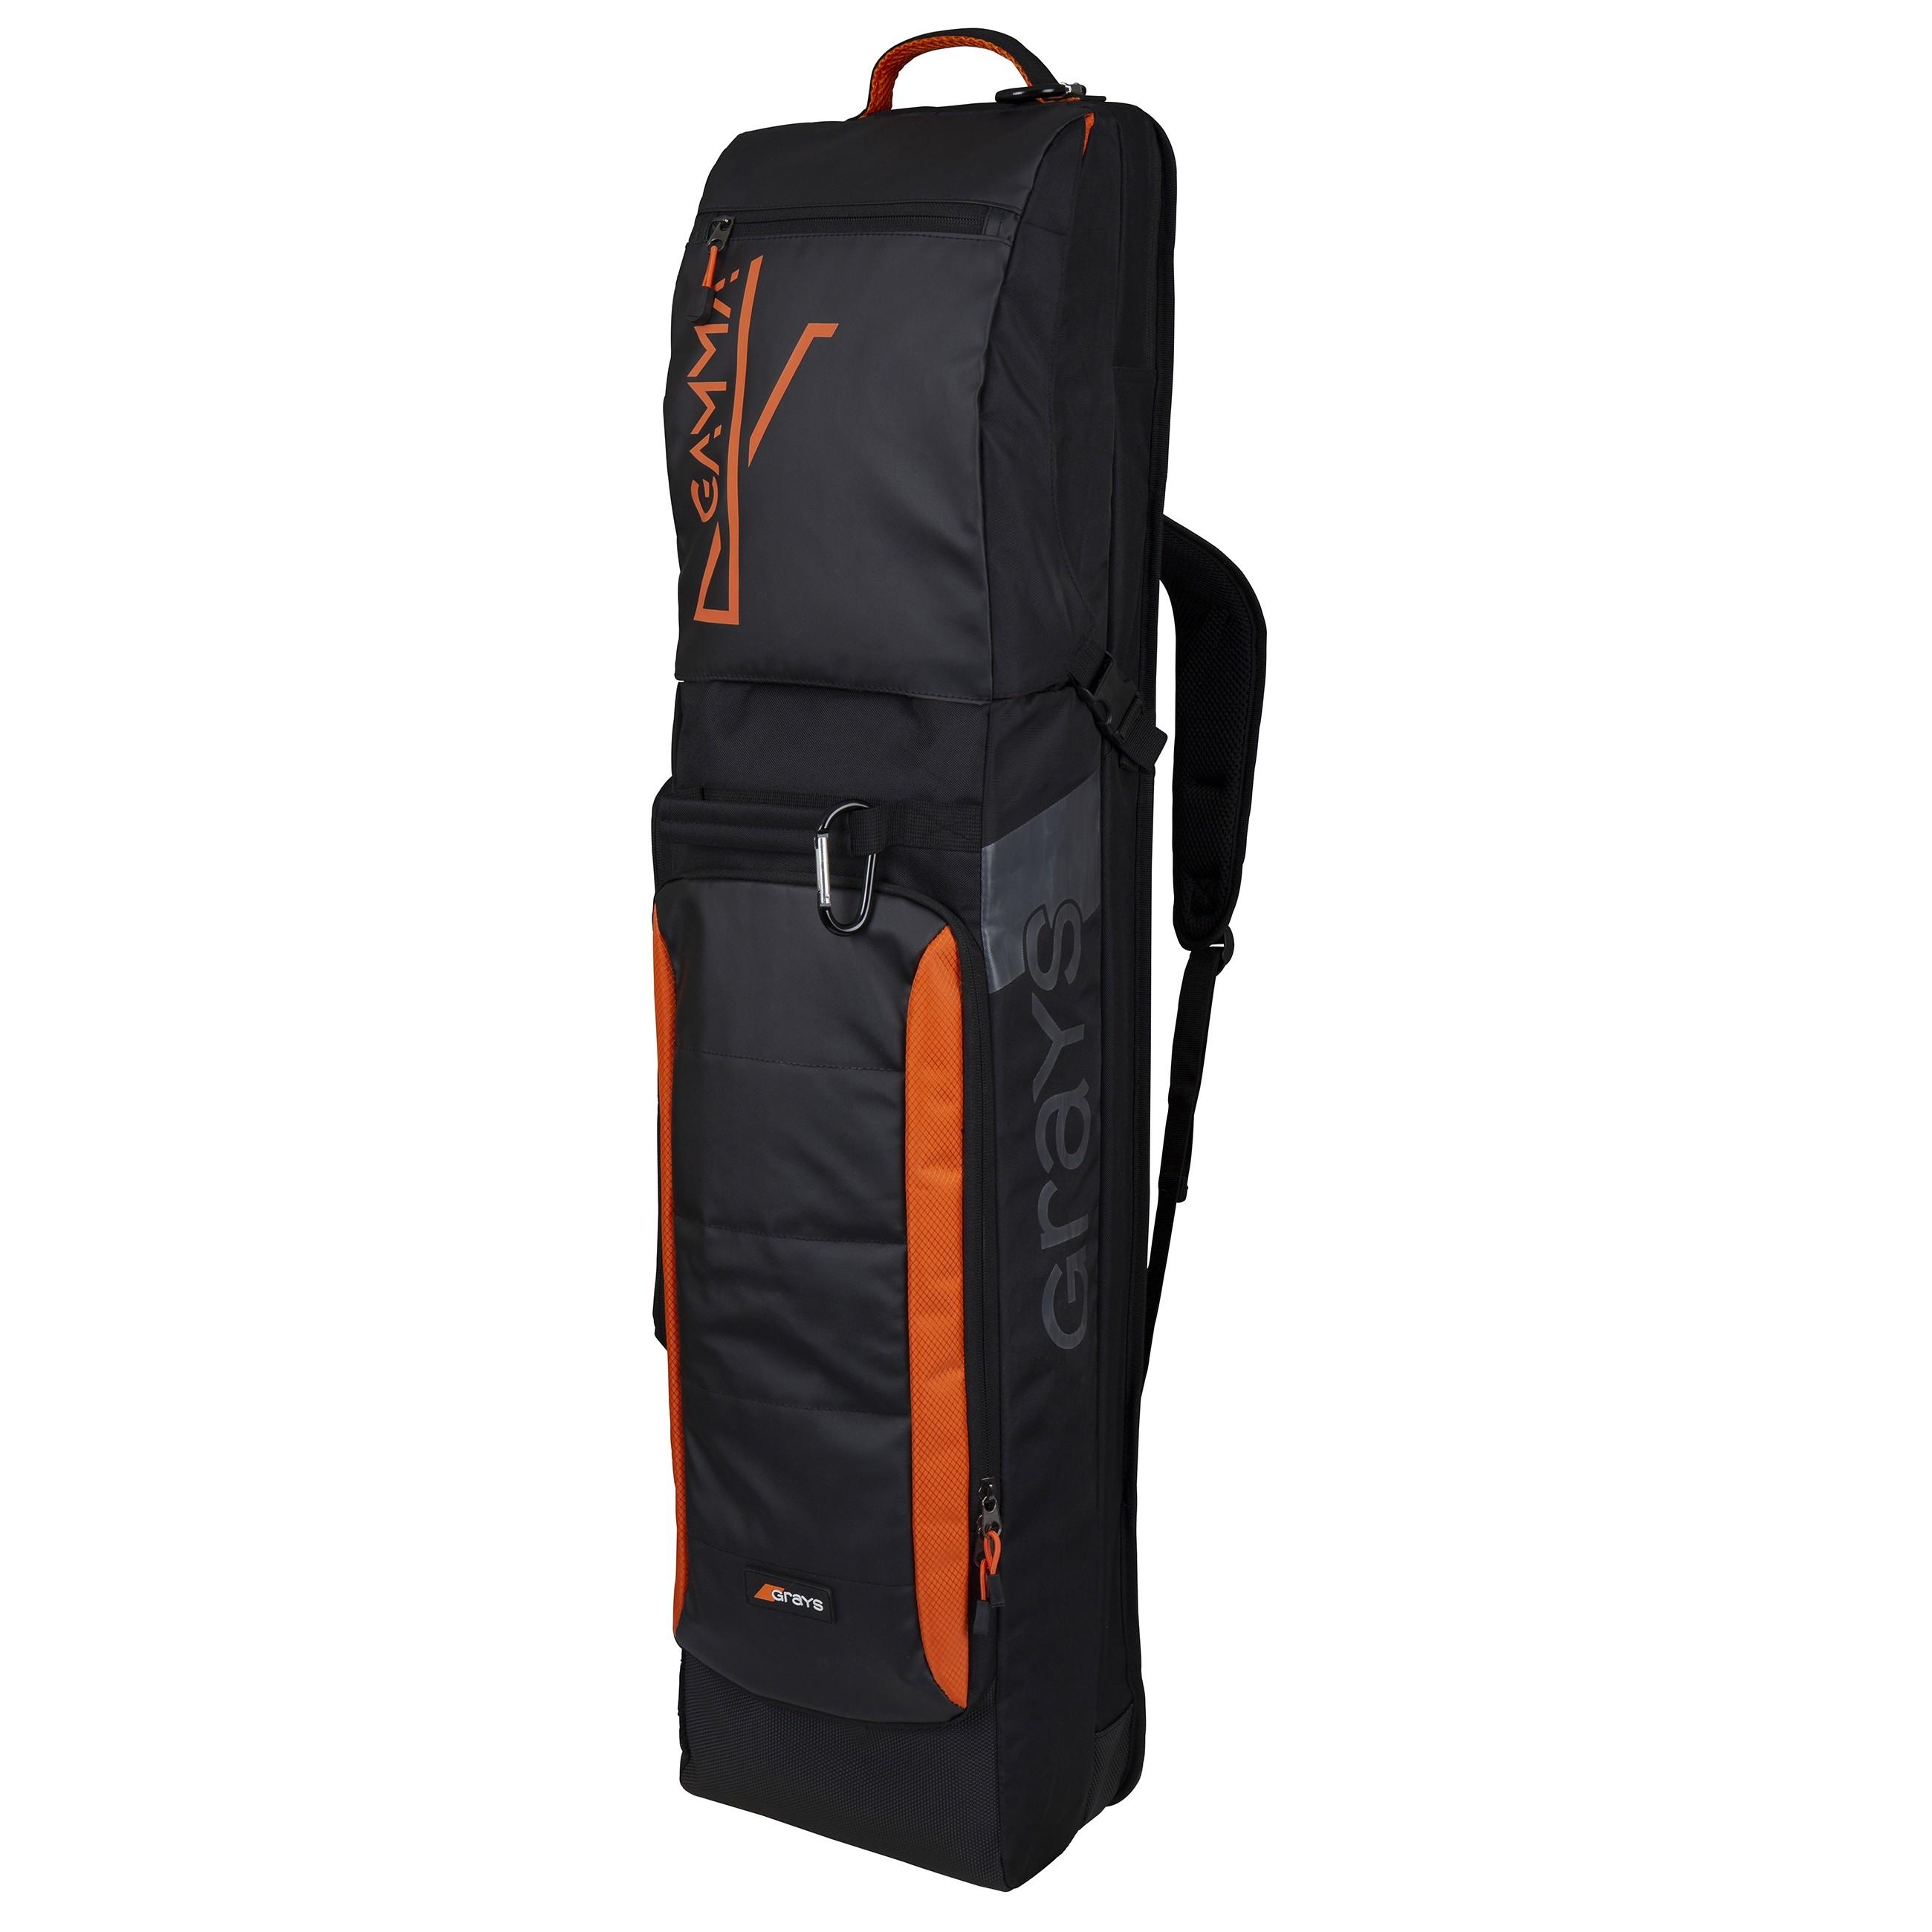 2021/22 Grays Gamma Hockey Kitbag - Black/Orange